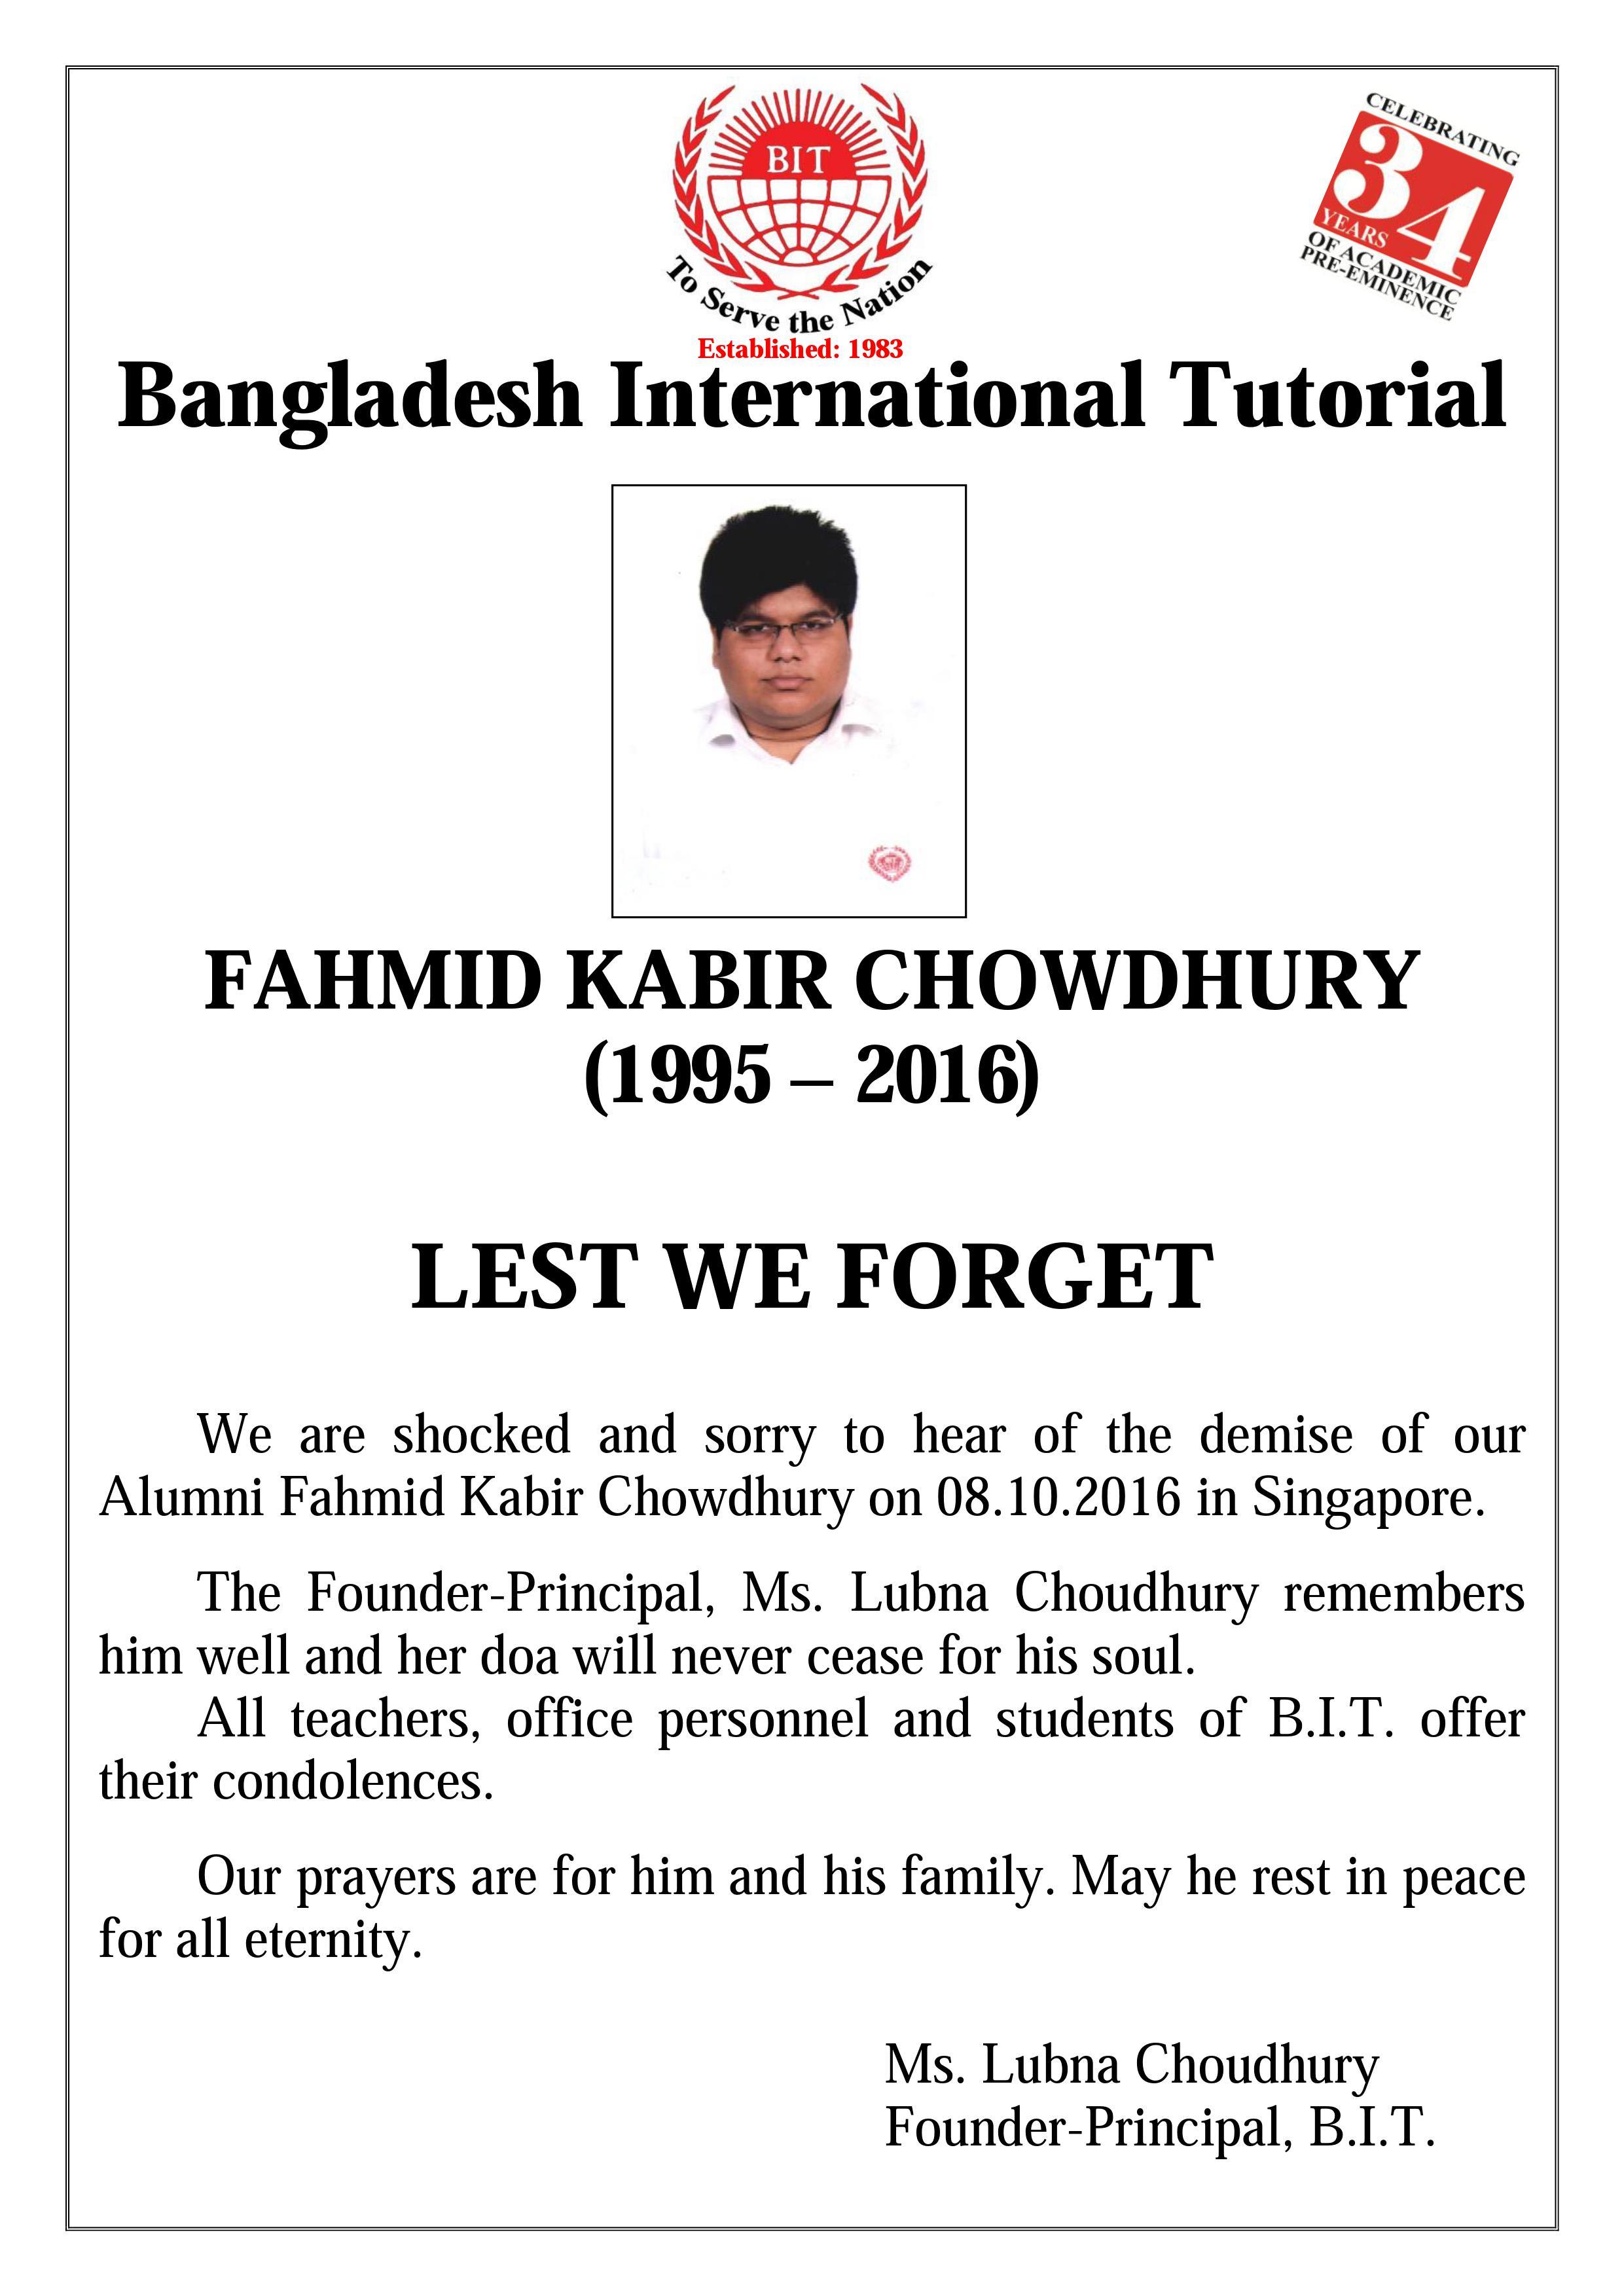 in-remembrance-of-fahmid-kabir-chowdhury-16102016